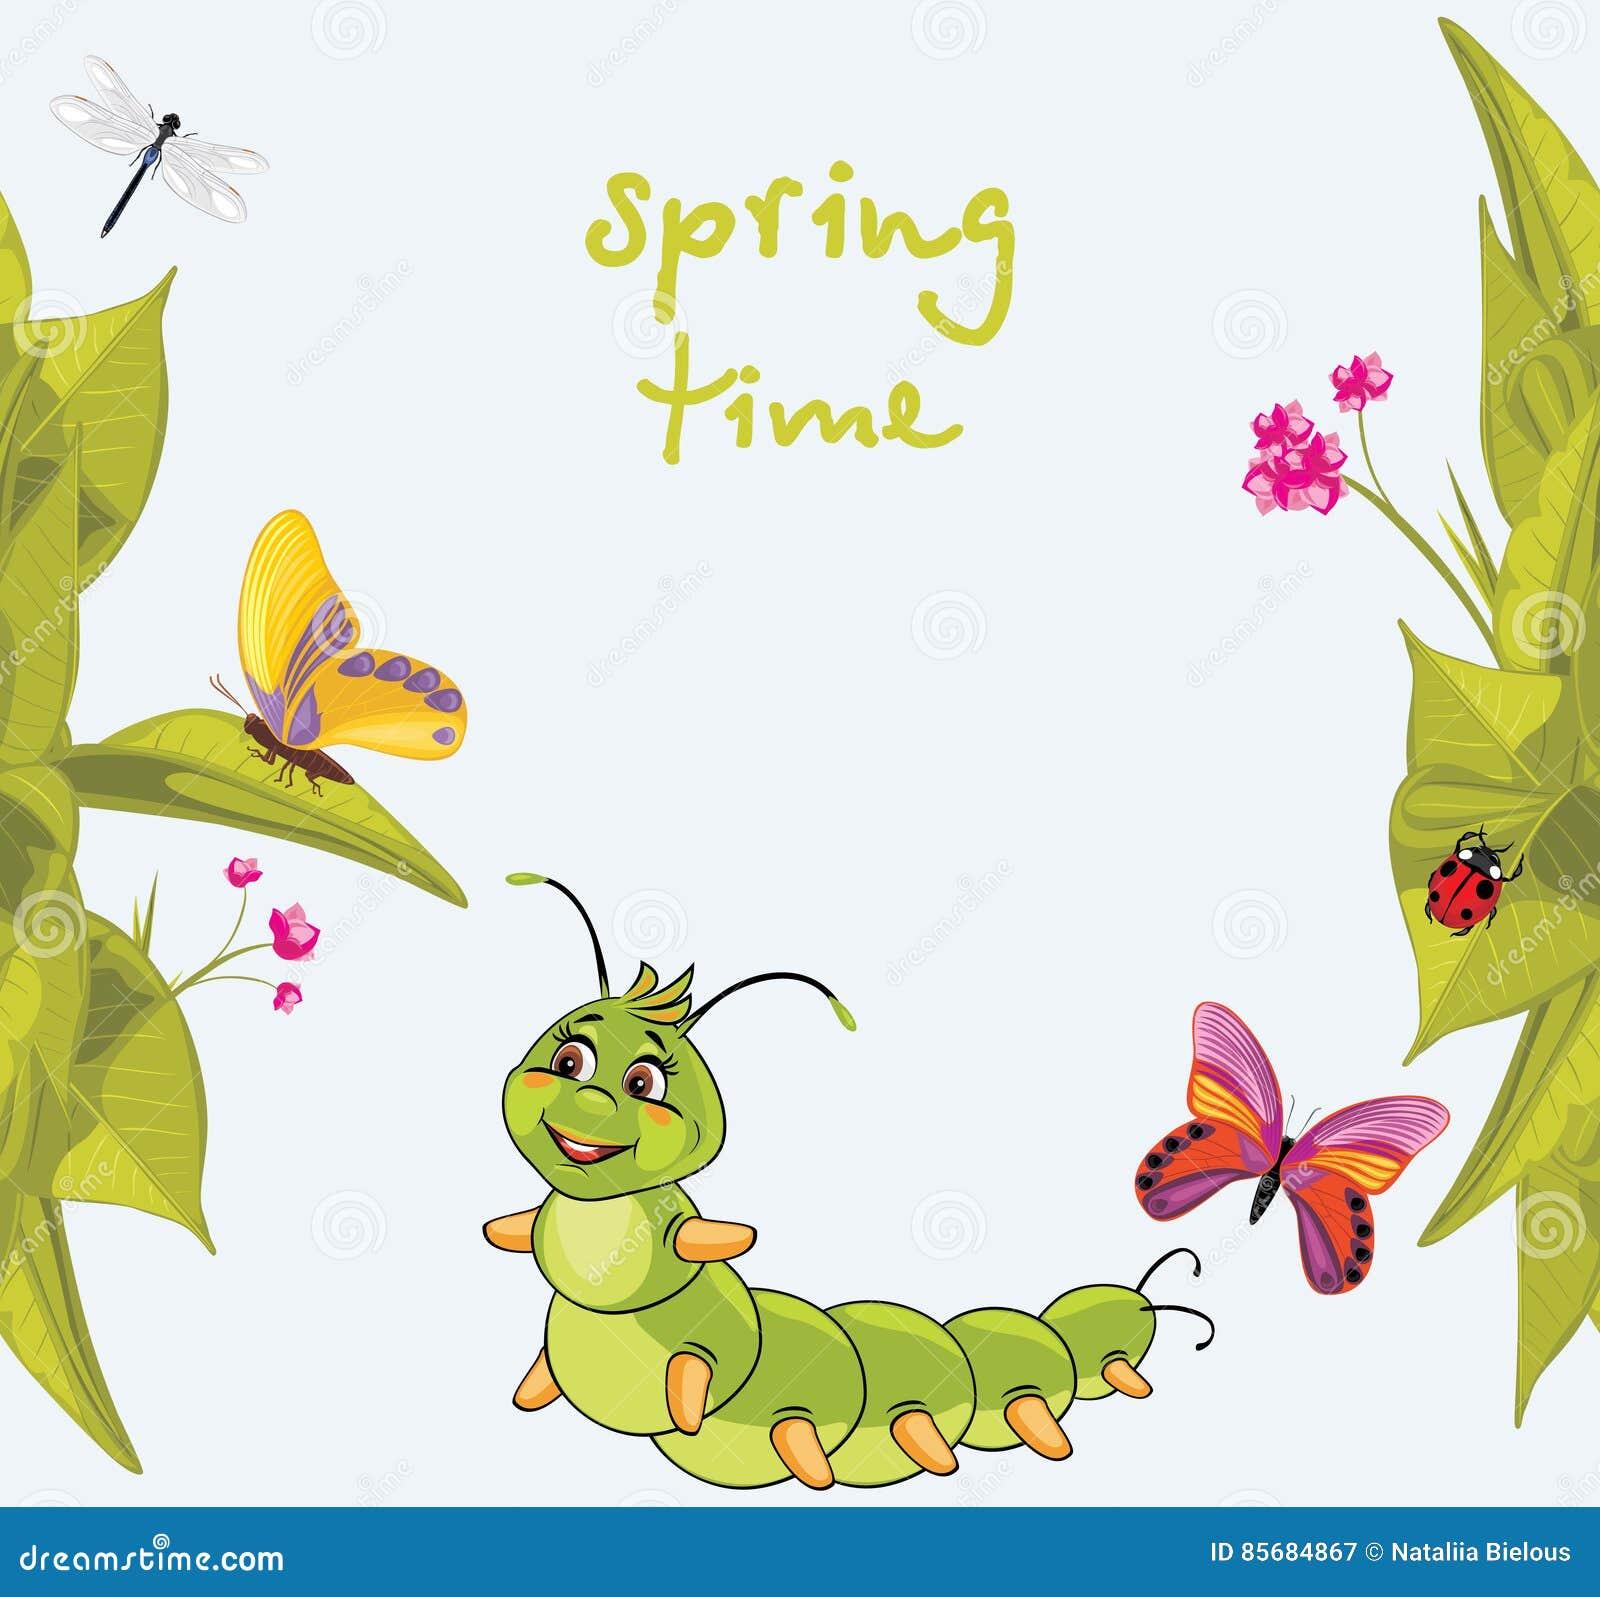 Cartoon Smiling Caterpillar Among Butterflies Stock Vector Illustration Of Butterfly Herb 85684867